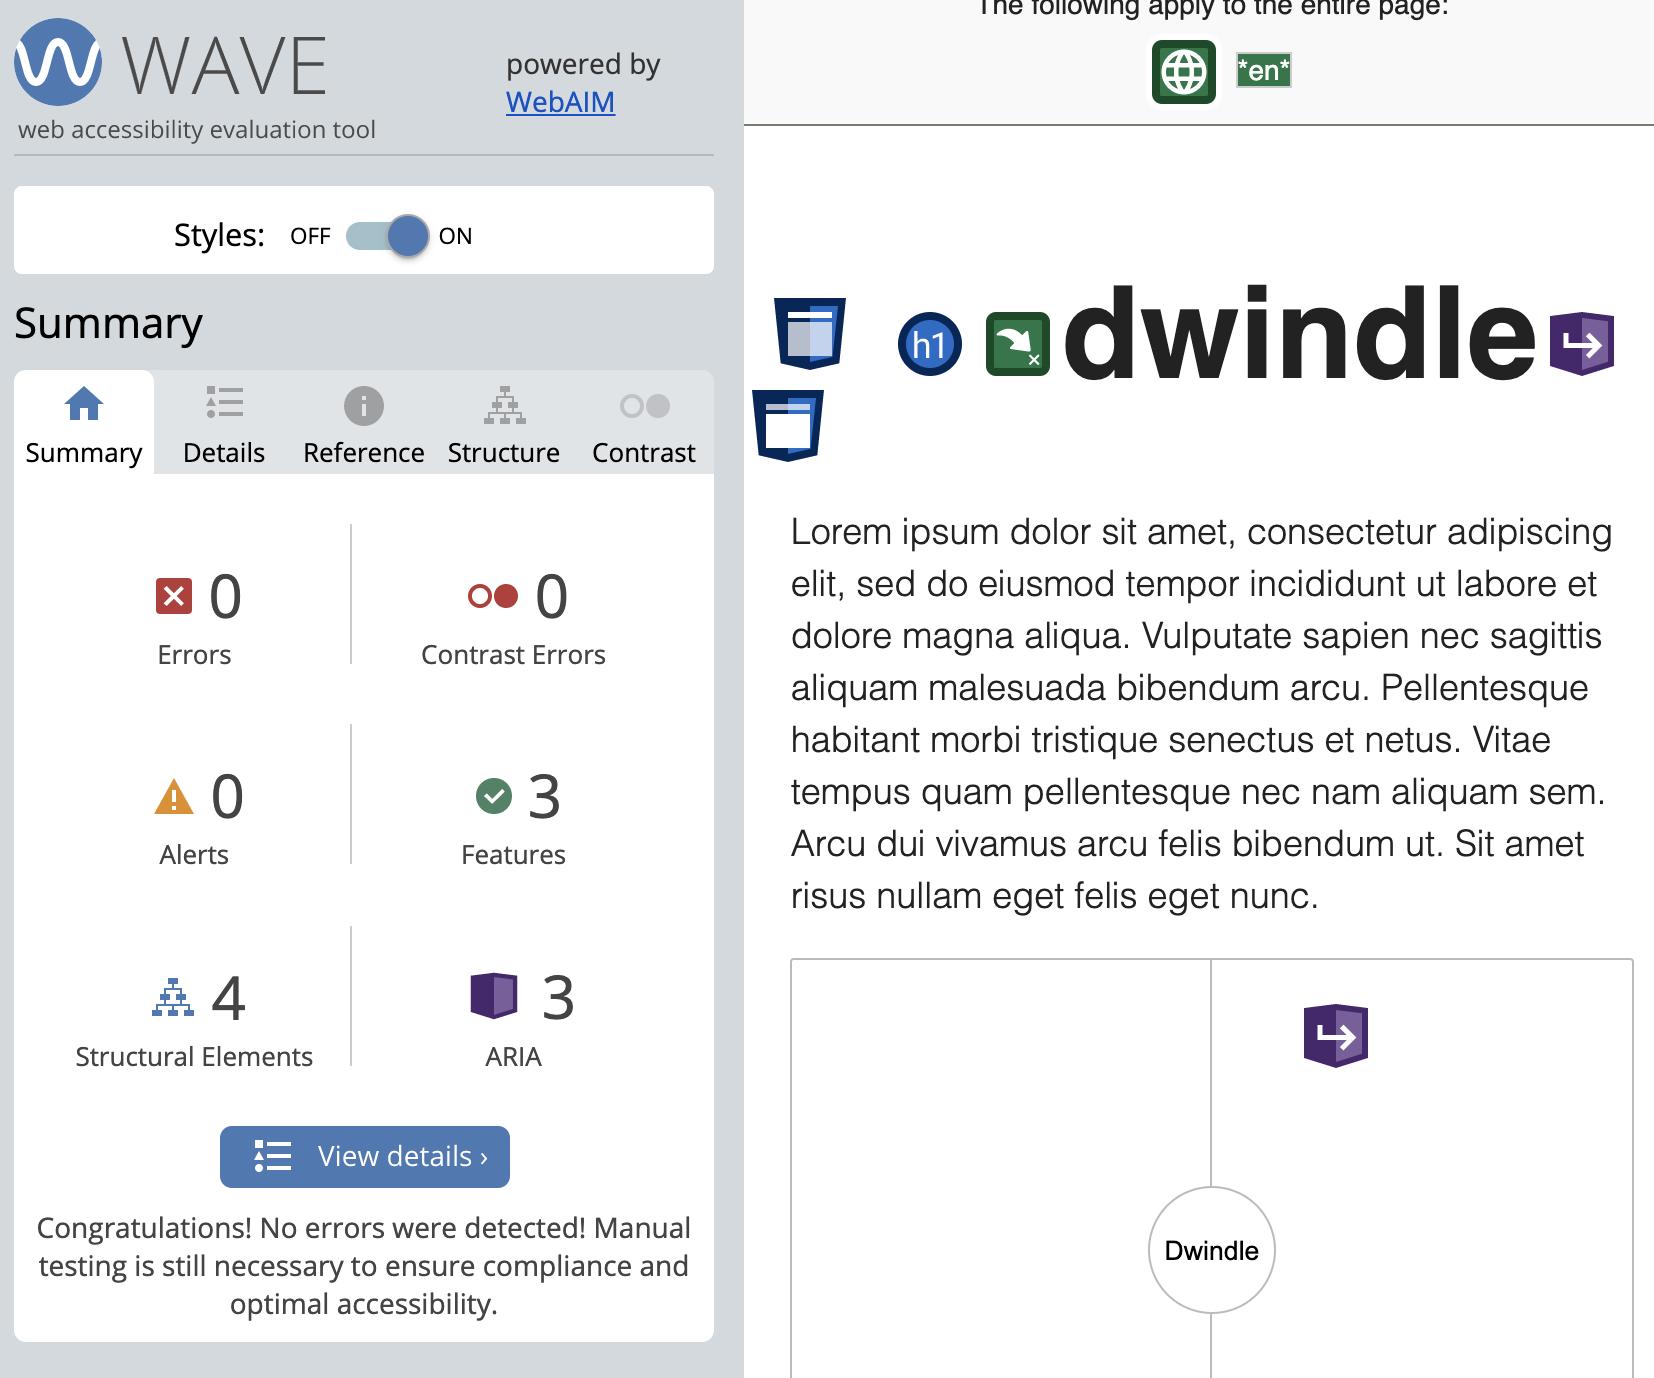 Screenshot of Wave results: no errors or warnings